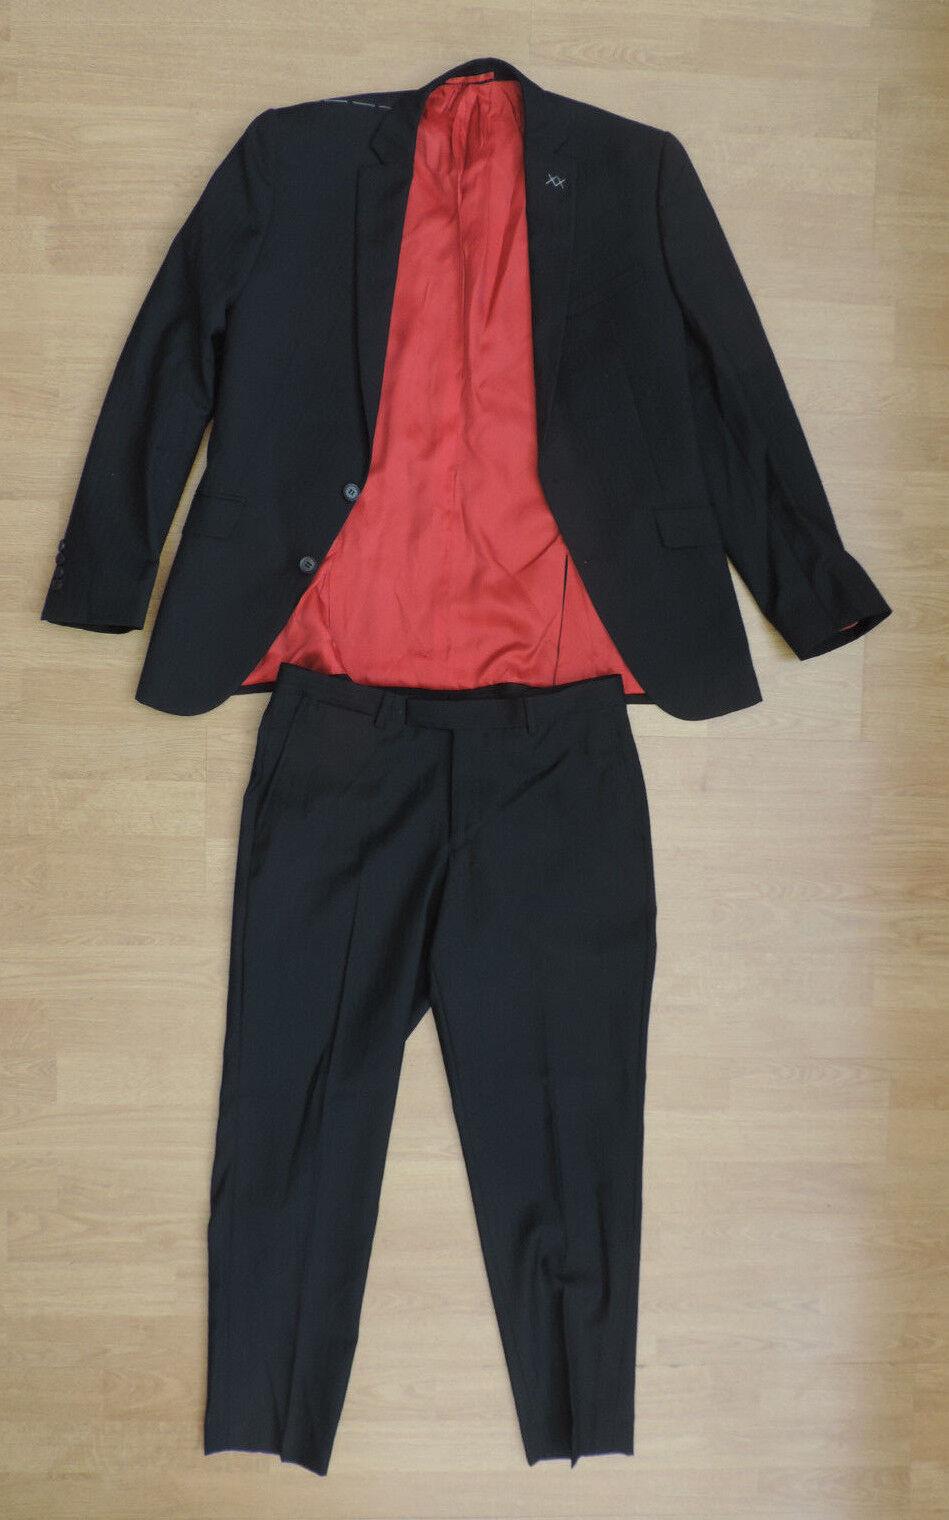 Da Uomo Moss Bros su Blazer misura 2 PEZZI Blazer su Pantaloni Nero Rosso G8-B6 8e7df2